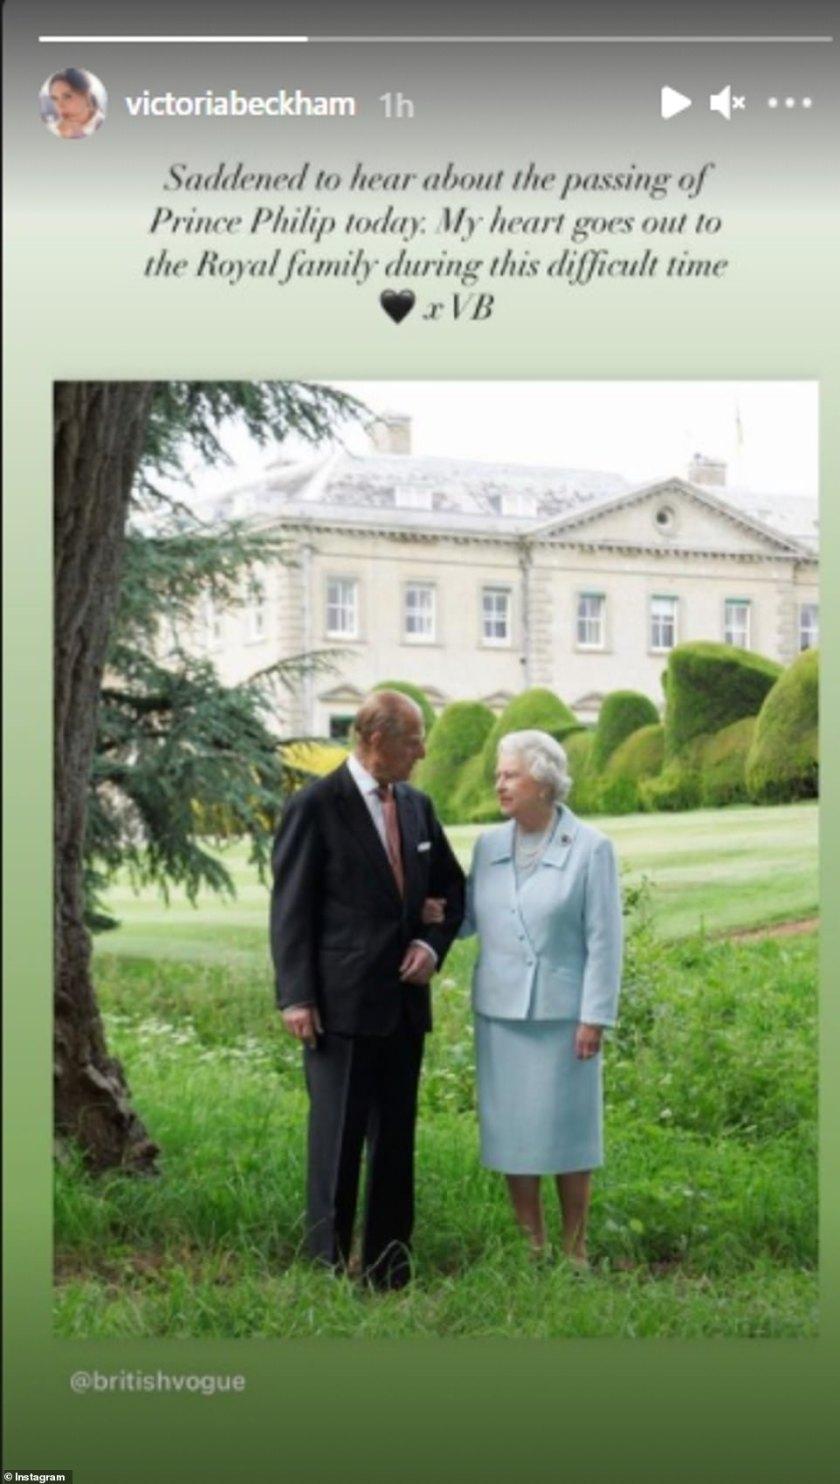 Saddened: Victoria Beckham took to Instagram to share she was saddened to hear of the Duke's passing